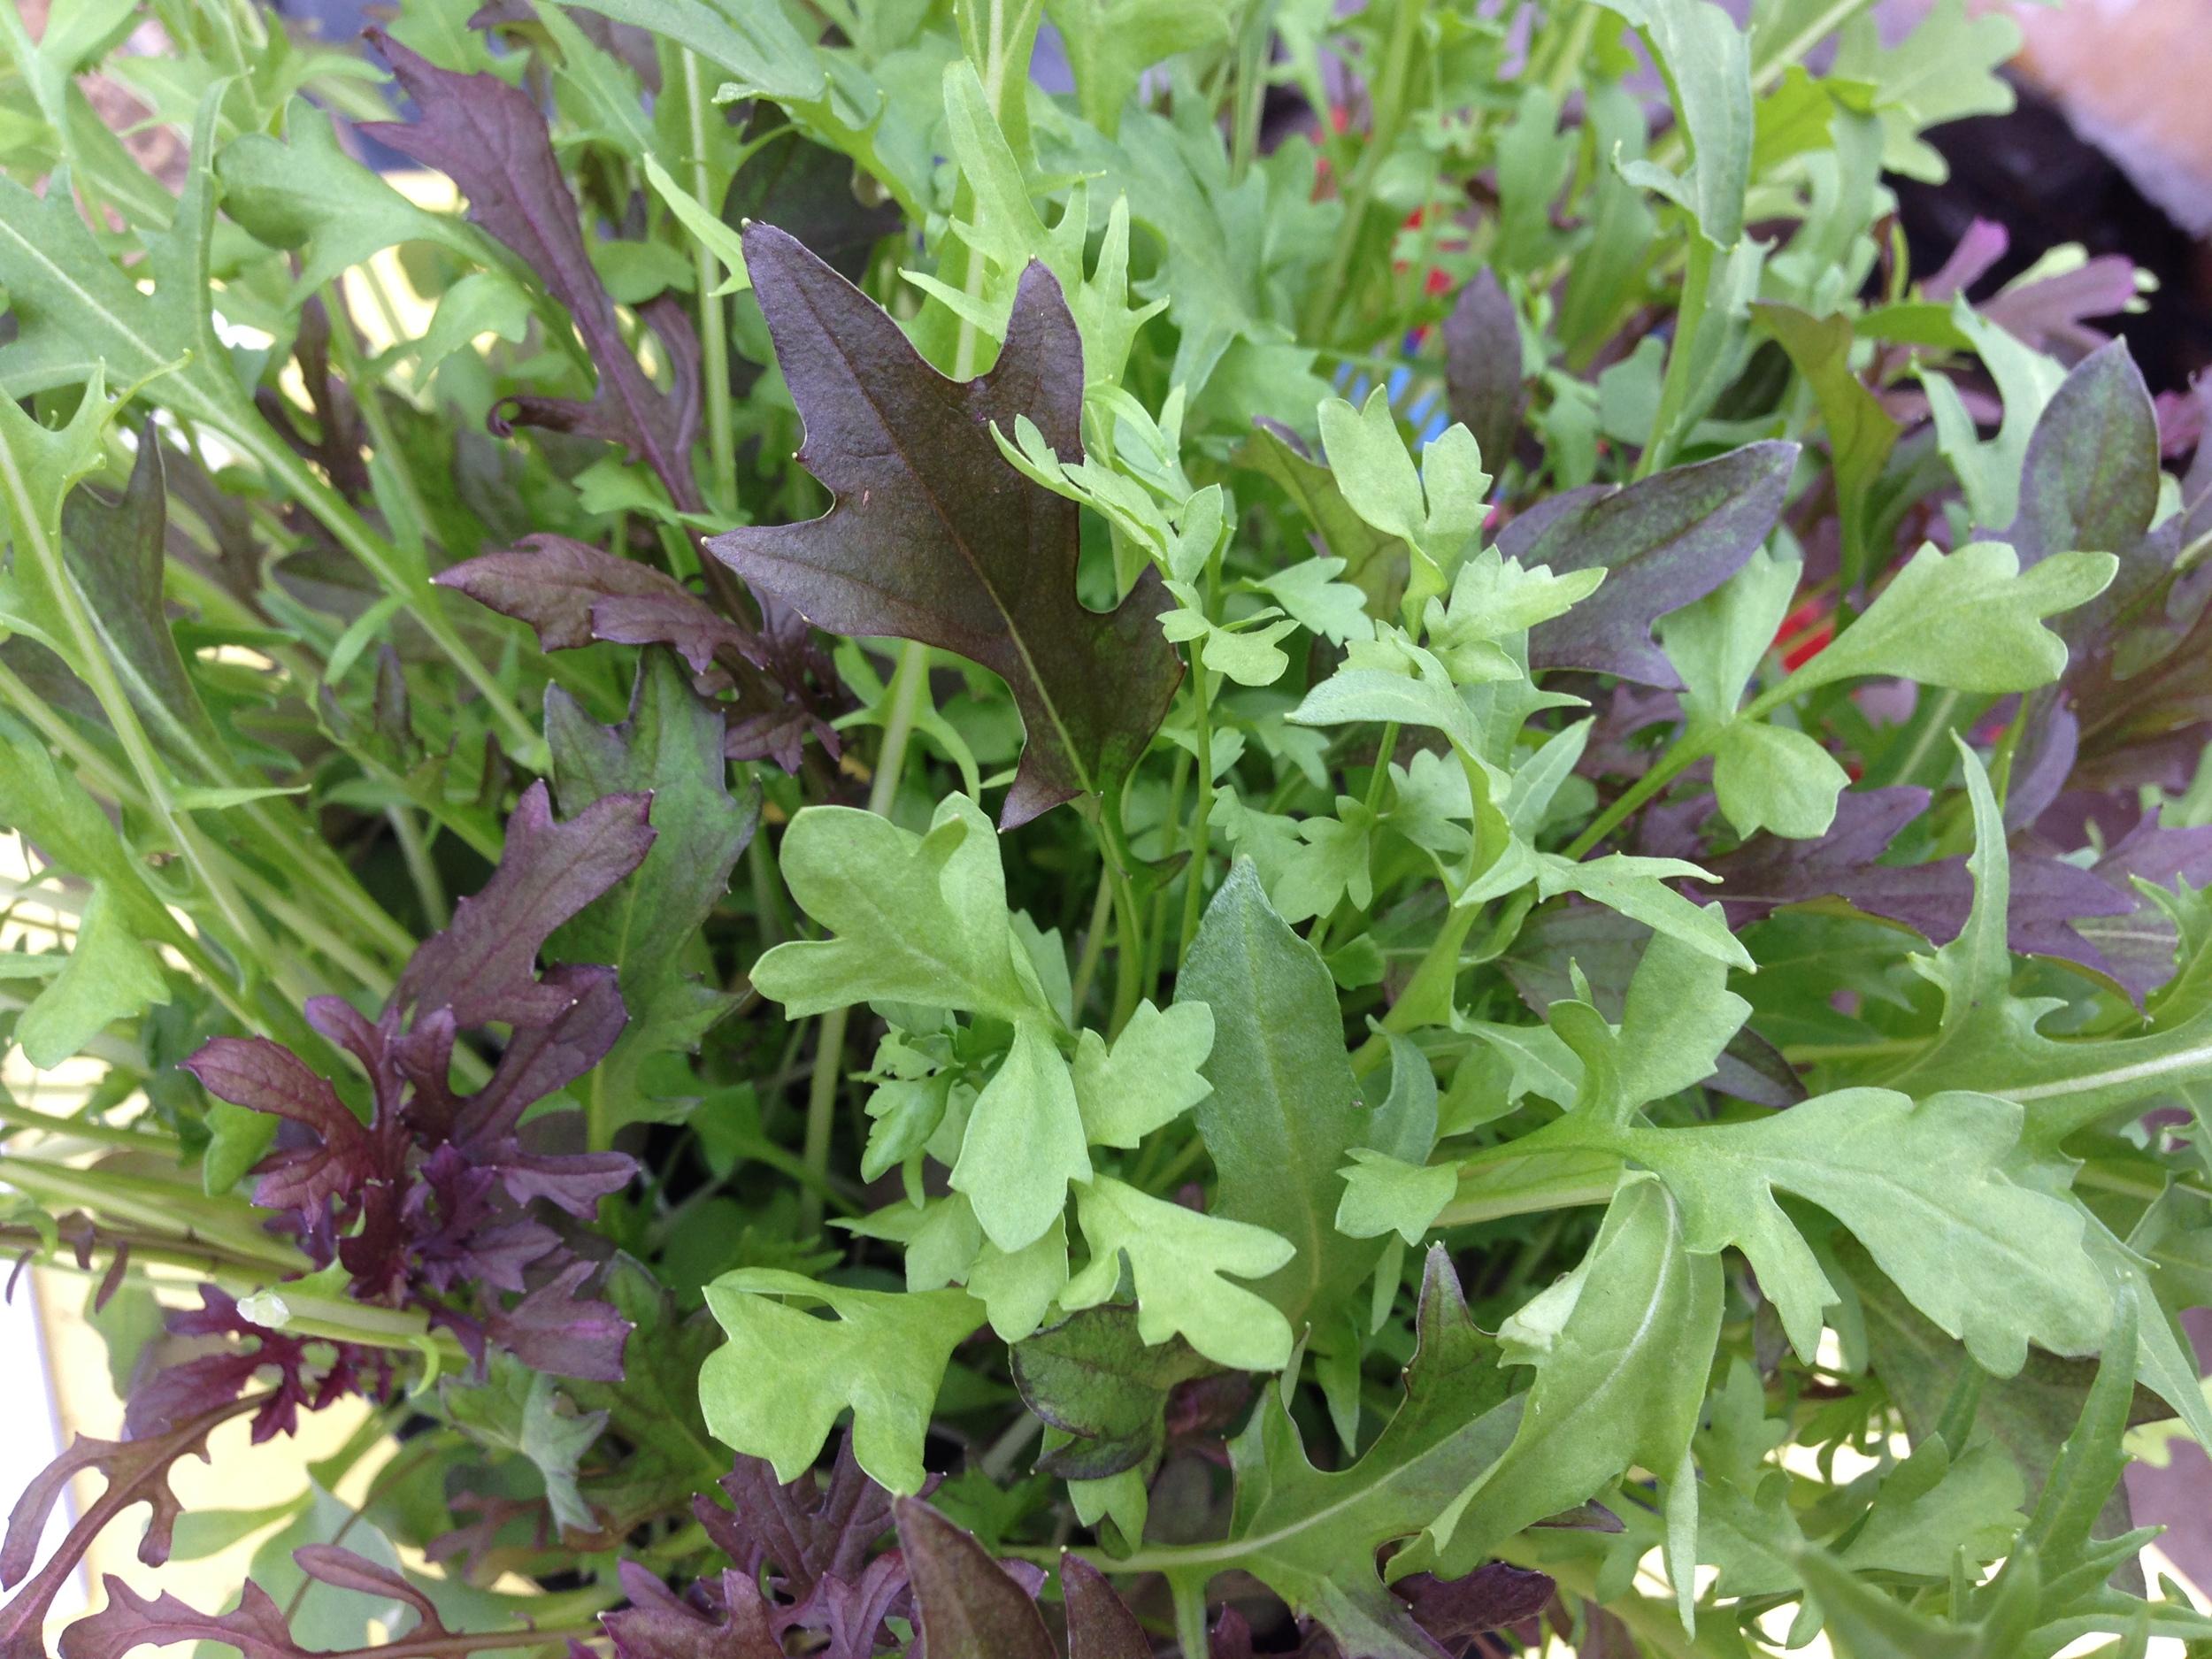 Frilly Leaf Mix